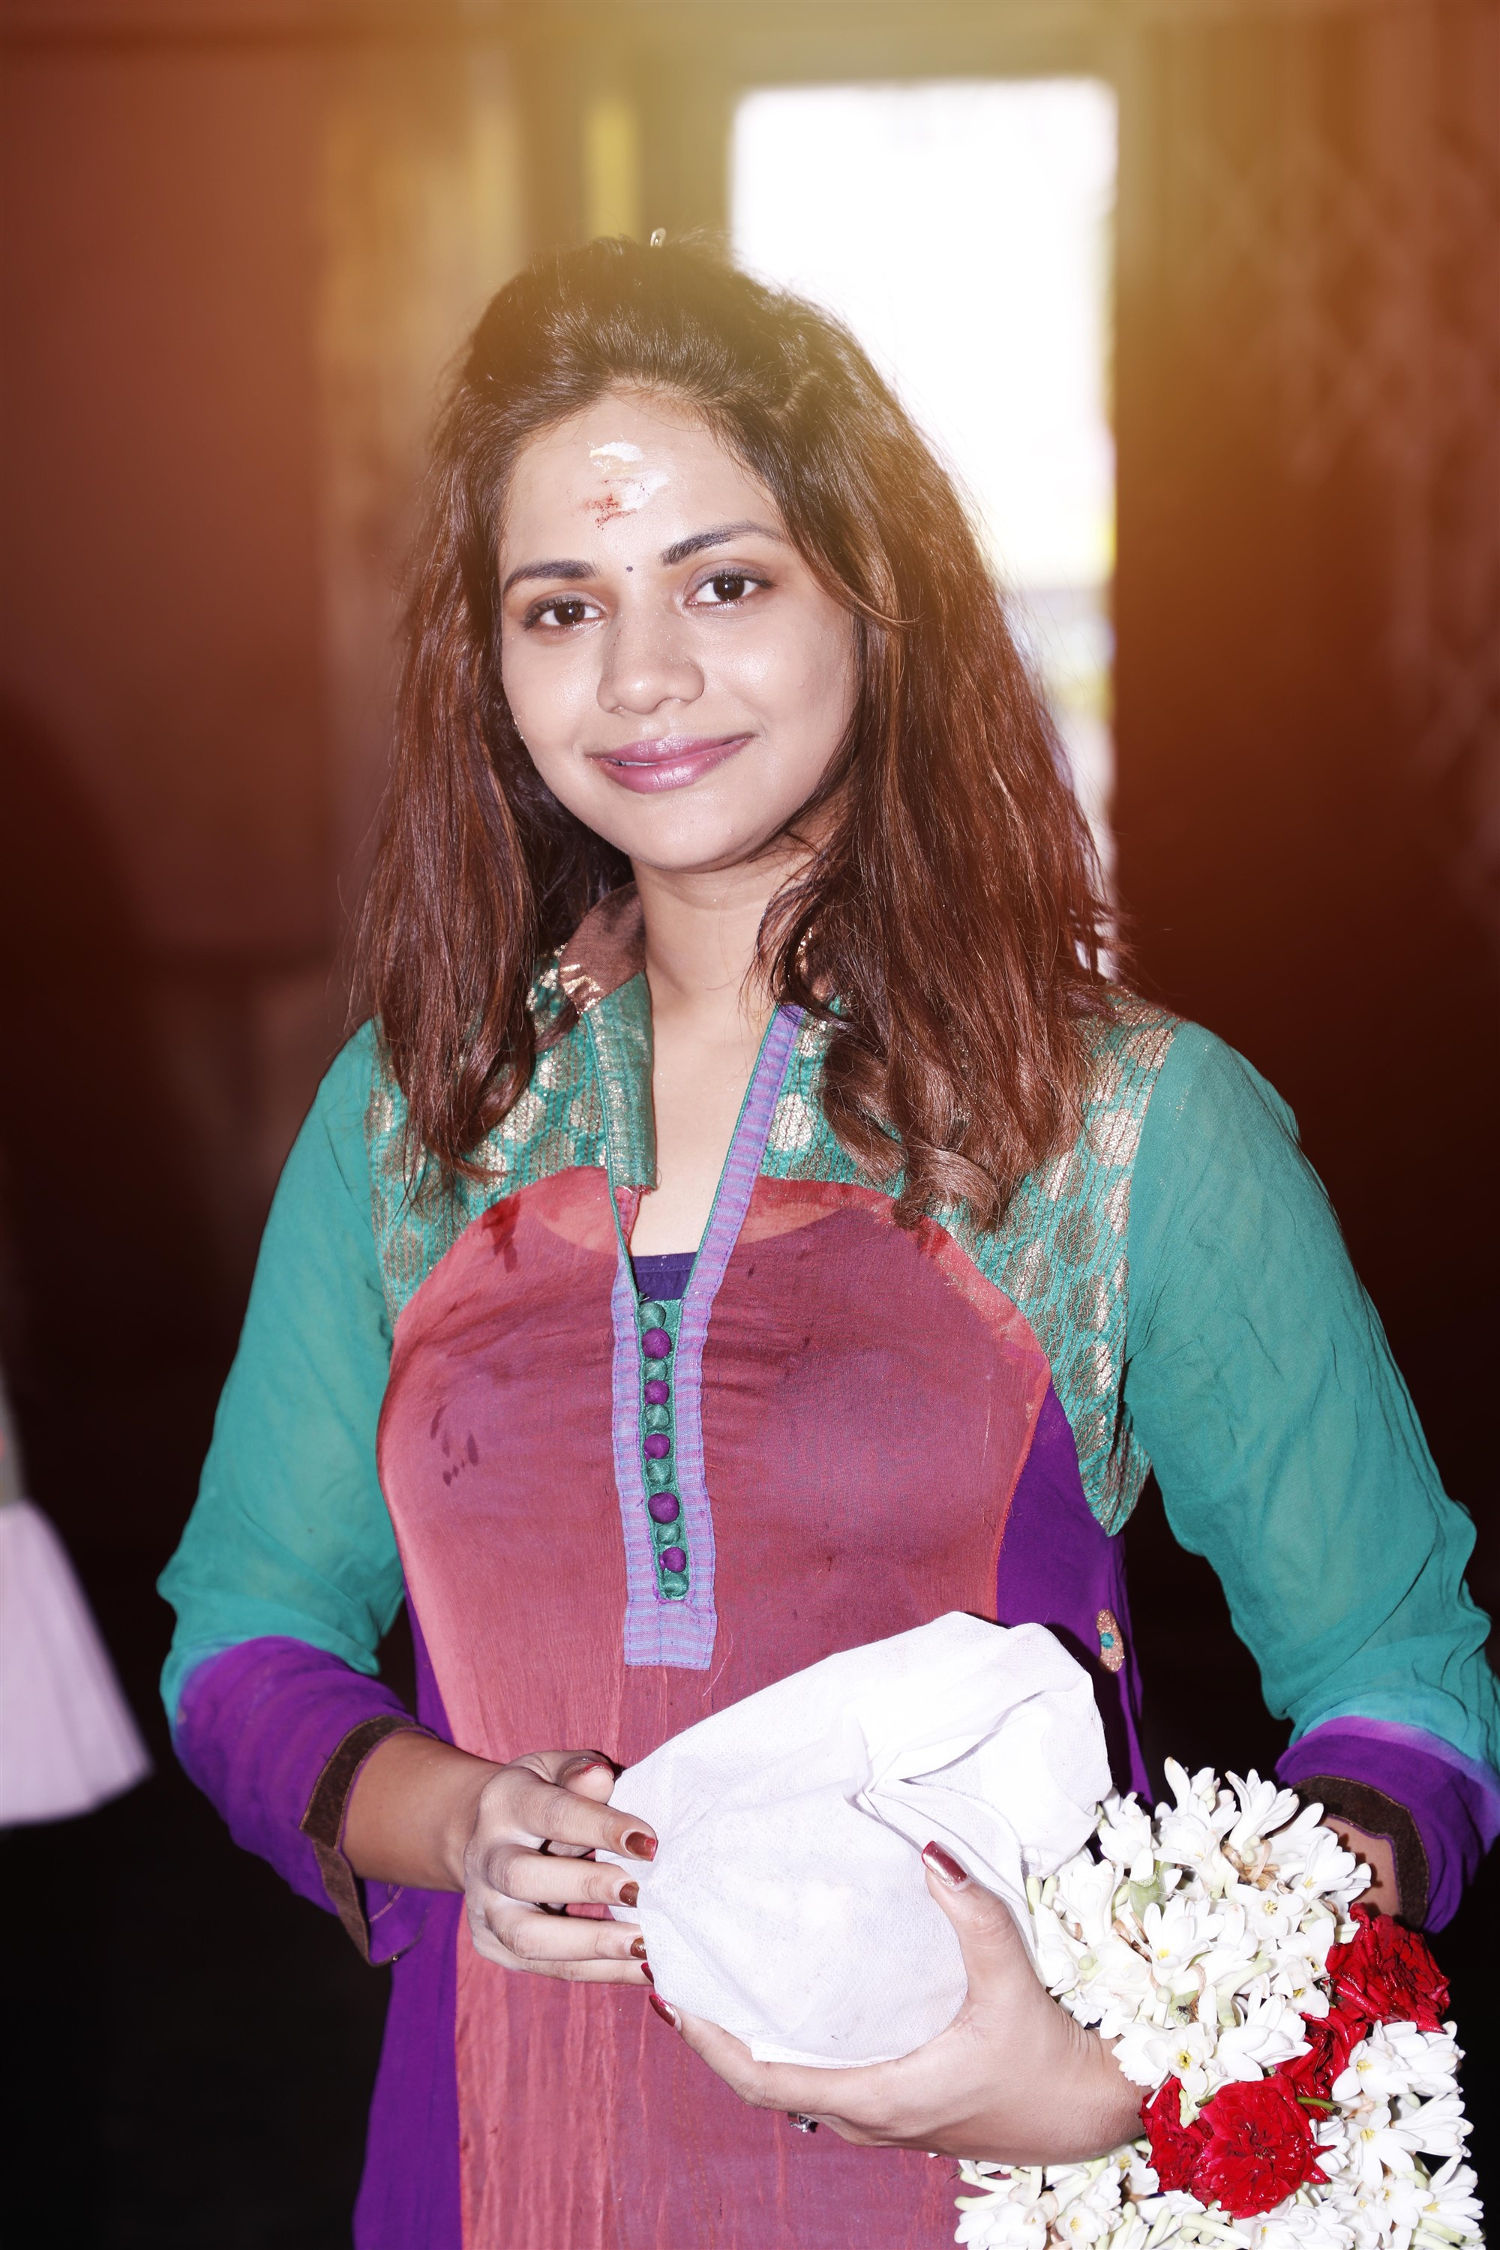 Actress Aishwarya Dutta @ Polladha Ulagil Bayangara Game (PubG) Movie Pooja Stills